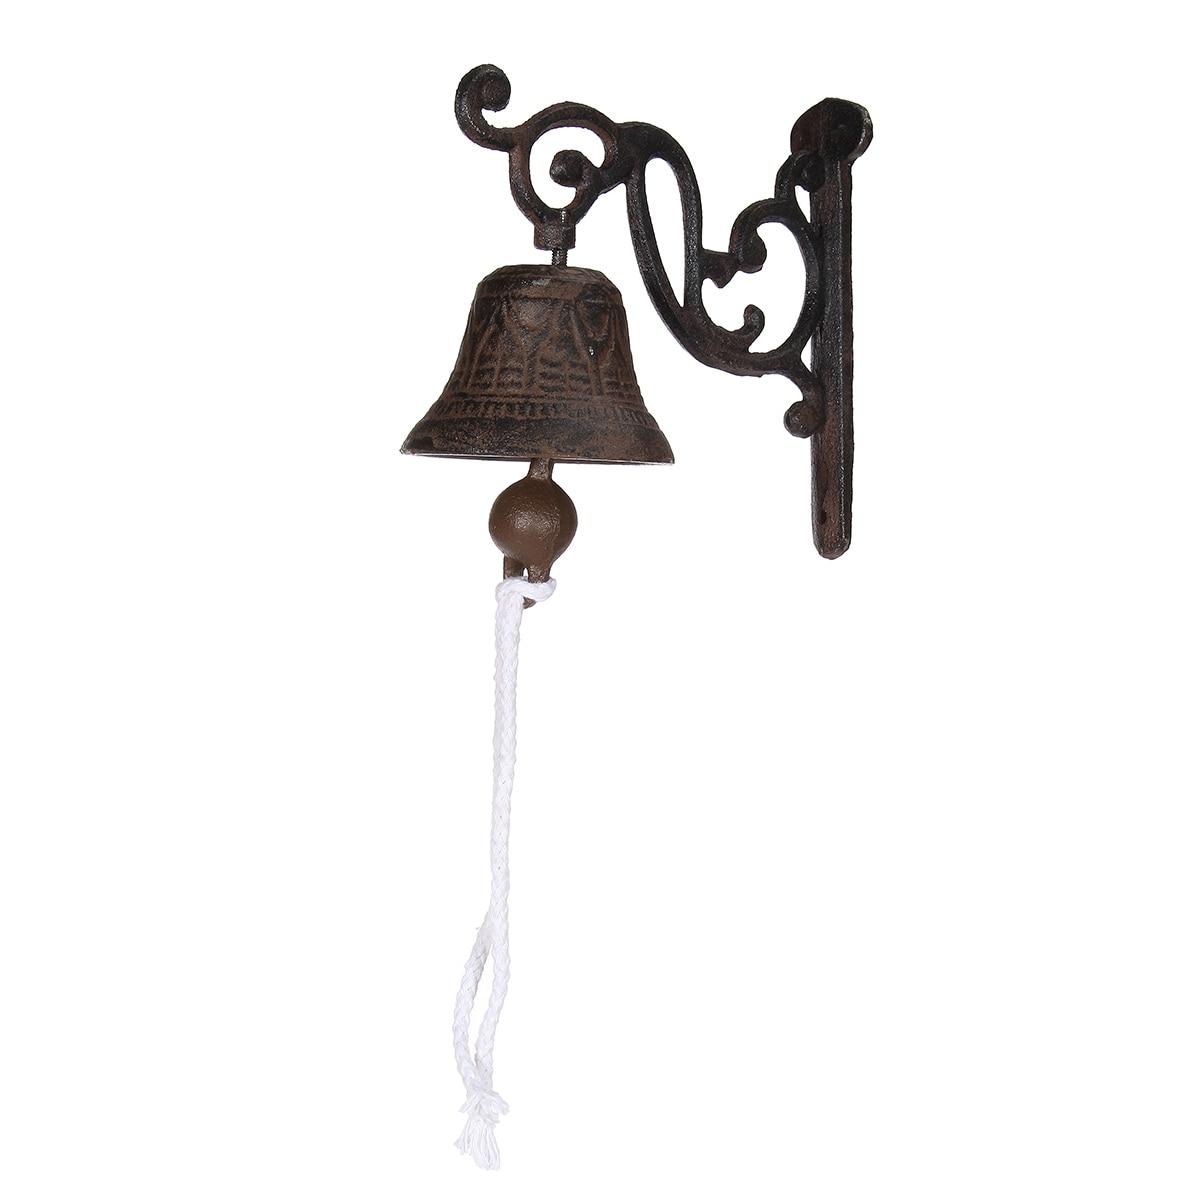 Vintage Style Brown Metal Cast Iron Door Bell Wall Mounted Garden Decoration